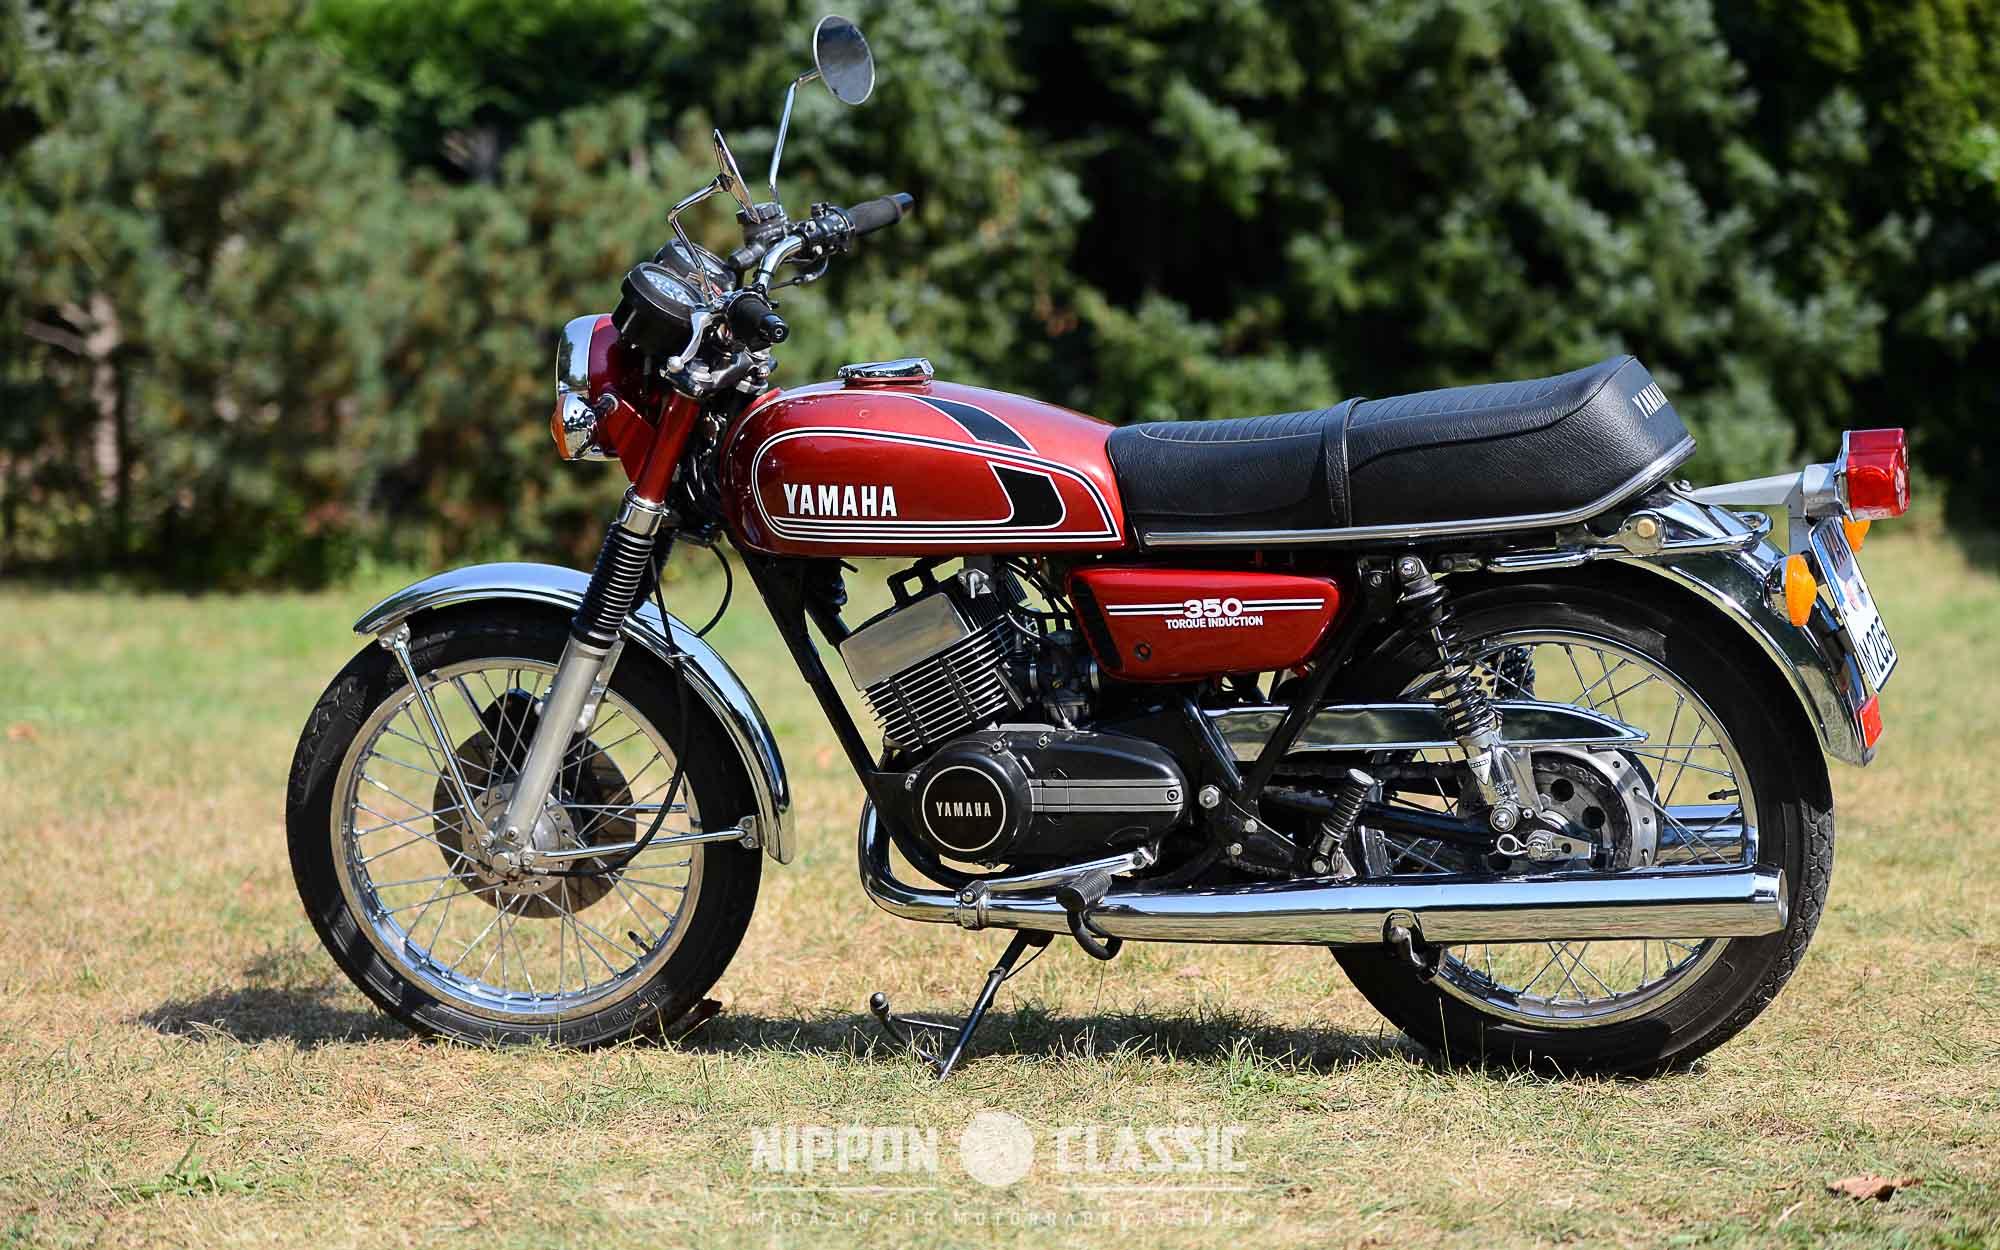 Yamaha RD 250 / RD 350